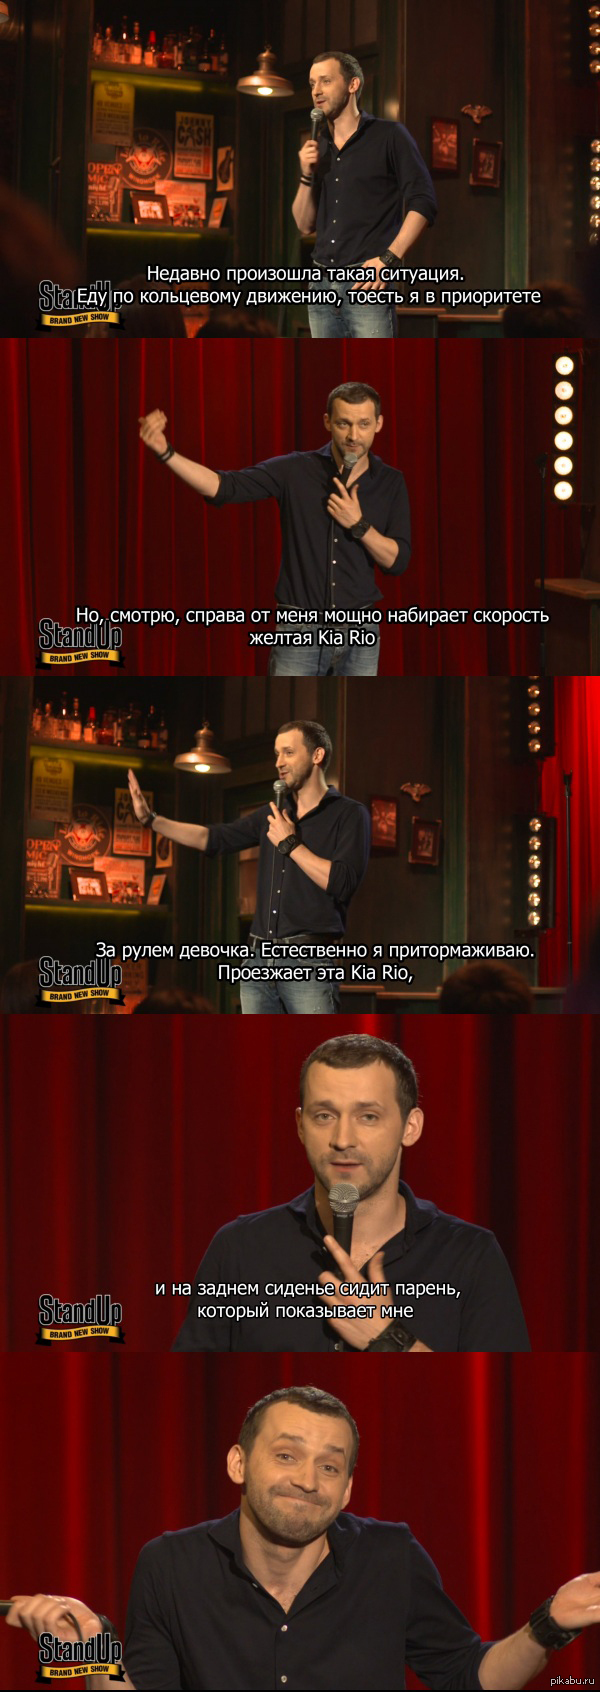 http://s4.pikabu.ru/post_img/2014/08/09/12/1407611406_1280253120.jpg